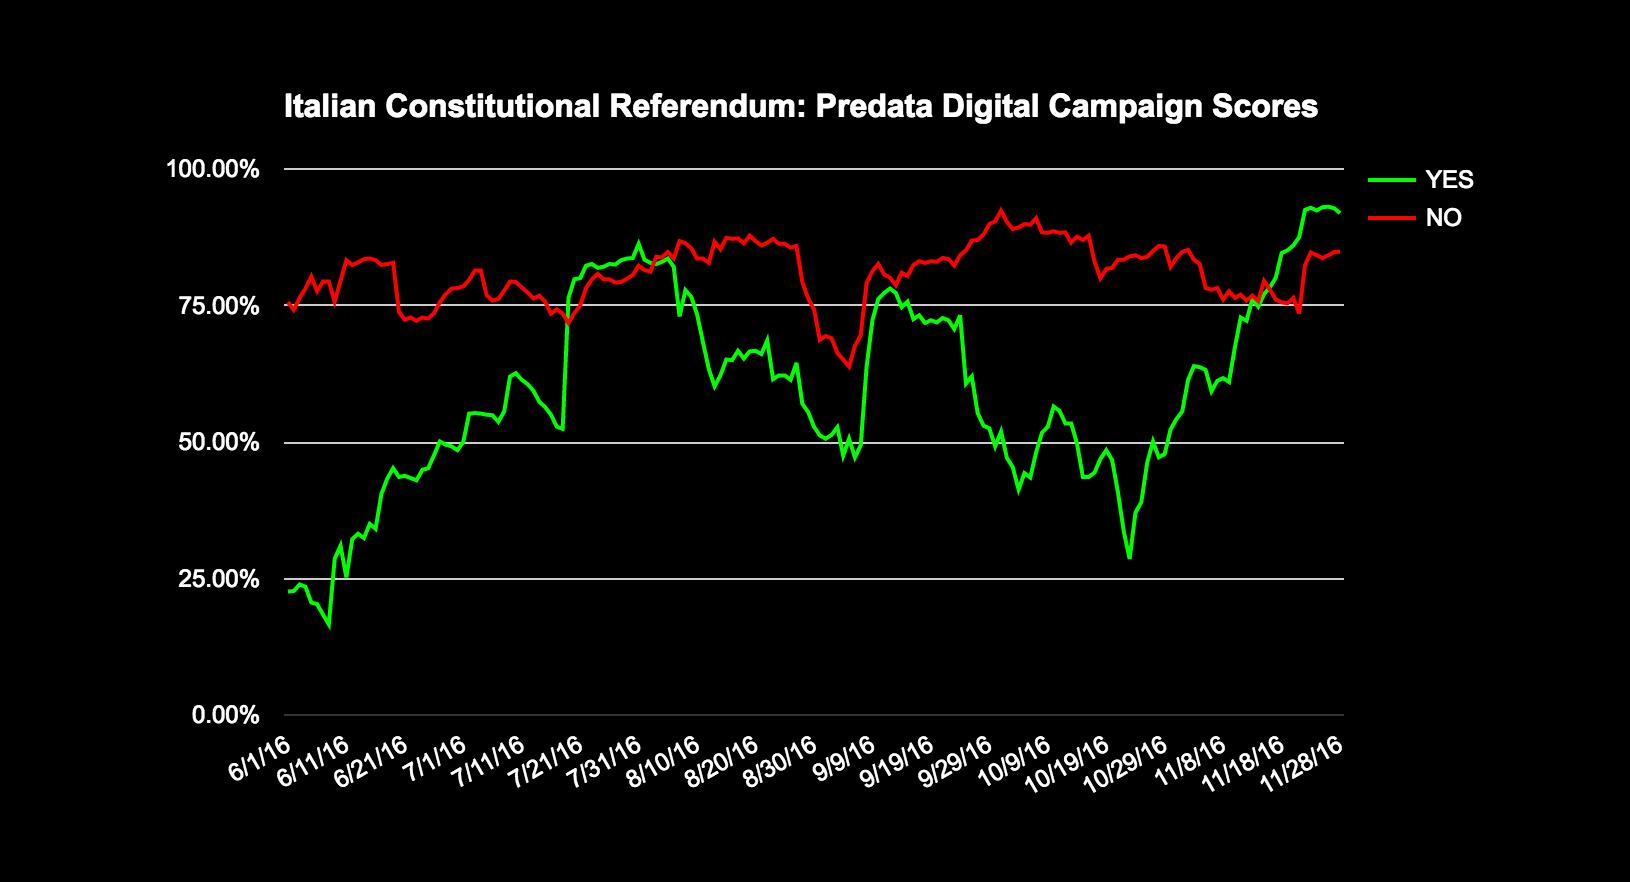 italy-referendum-predata-campaign-scores